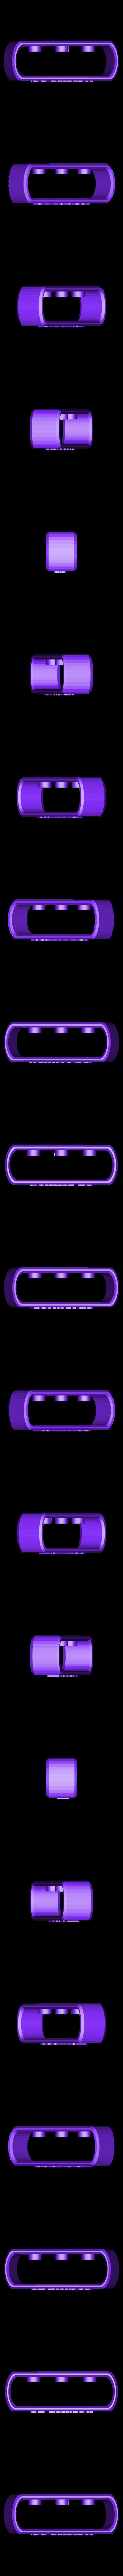 WatchBucles_withText.stl Download free STL file Buckle for Garmin 220 watch bracelet • 3D printable design, Julien_DaCosta